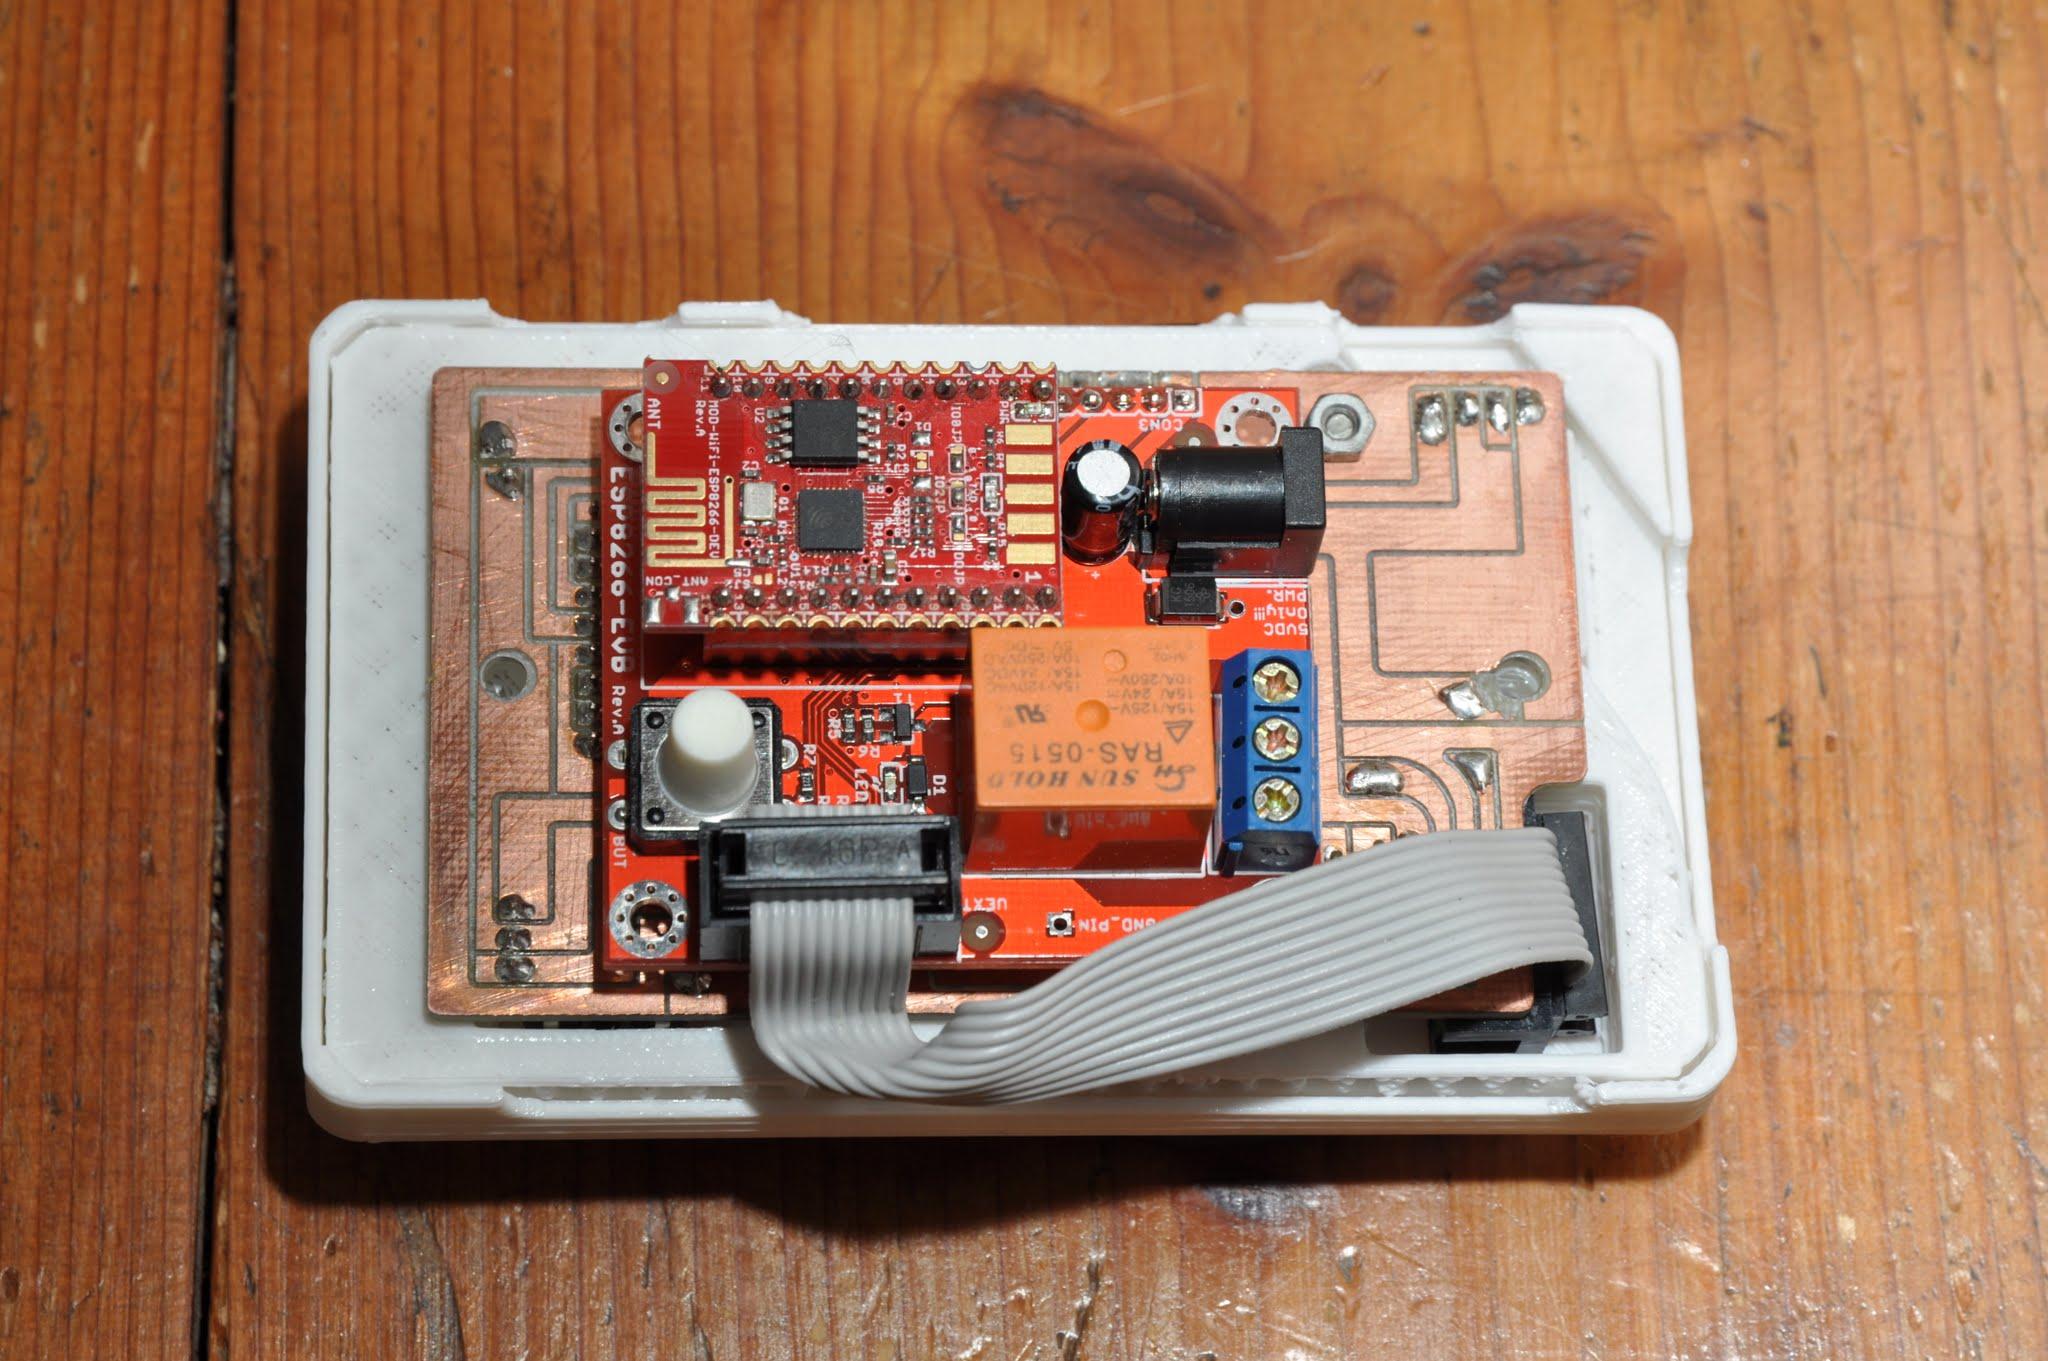 SST - ESP8266 Smart Thermostat WiFi IoT ready | Hackaday io